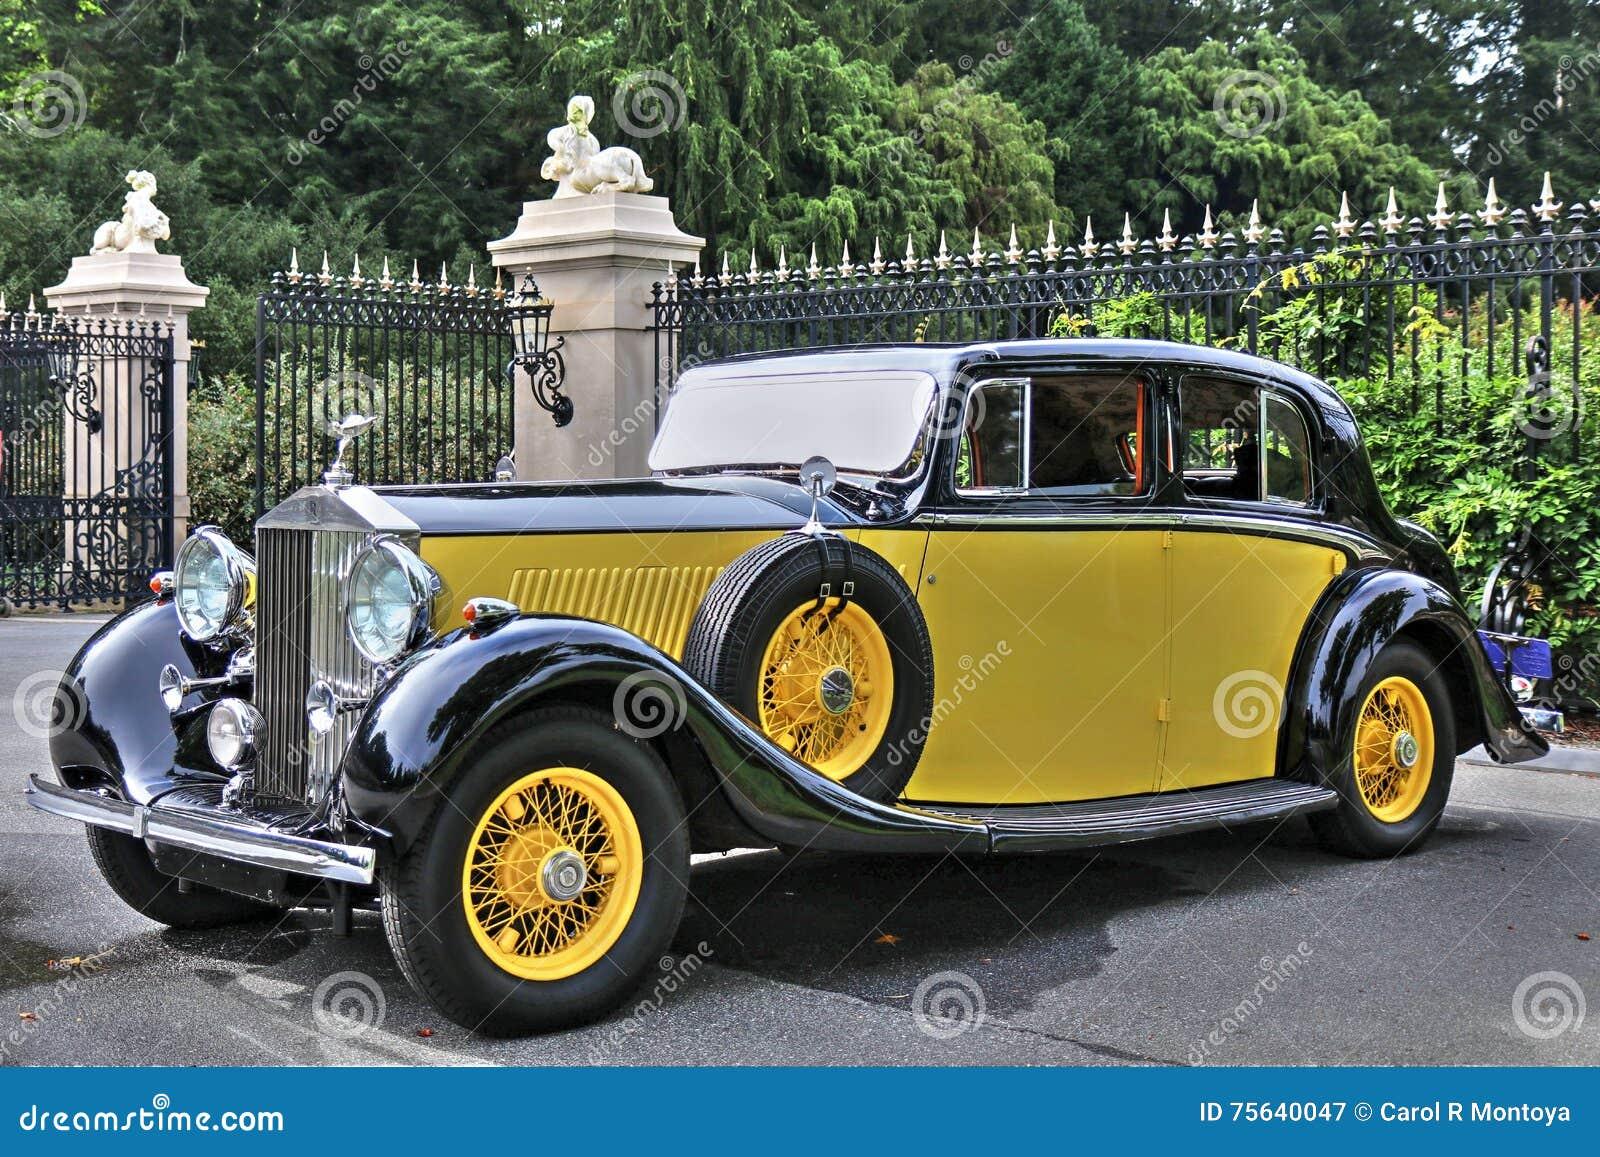 1934 Rolls Royce Phantom II i guling